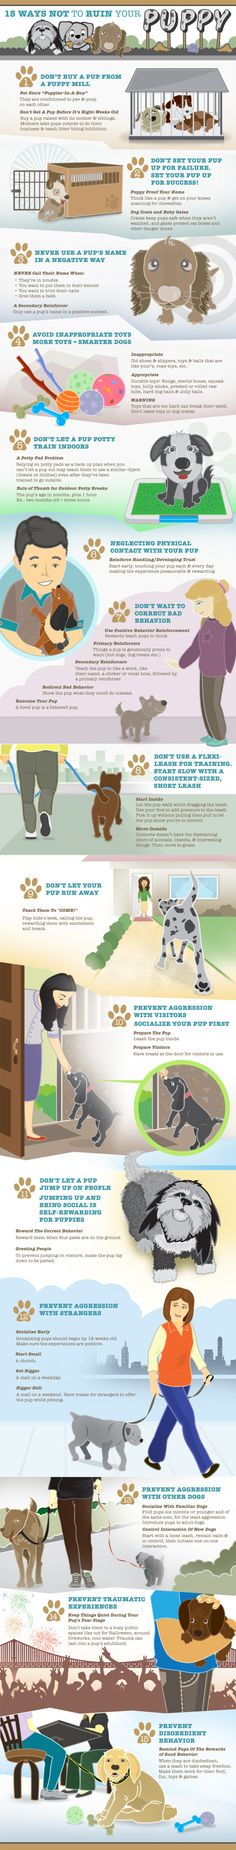 Puppy Training Graphic